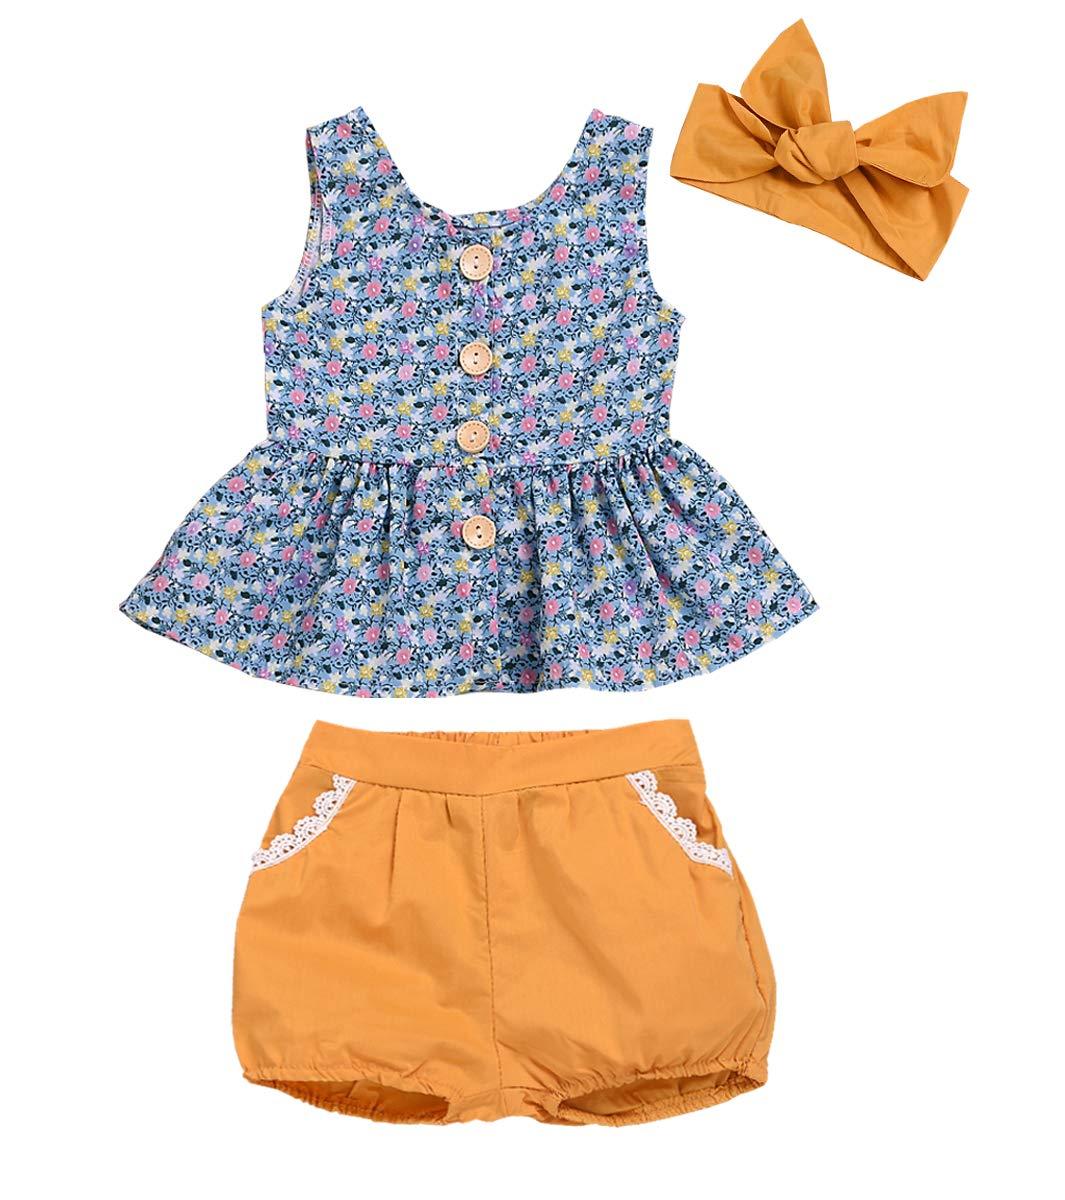 Kids ToddlerBaby Girls Shorts Outfits Set Floral Print Ruffle Dress Shirt Tops+Short Pants Summer Dresses 3Pc Clothes Set